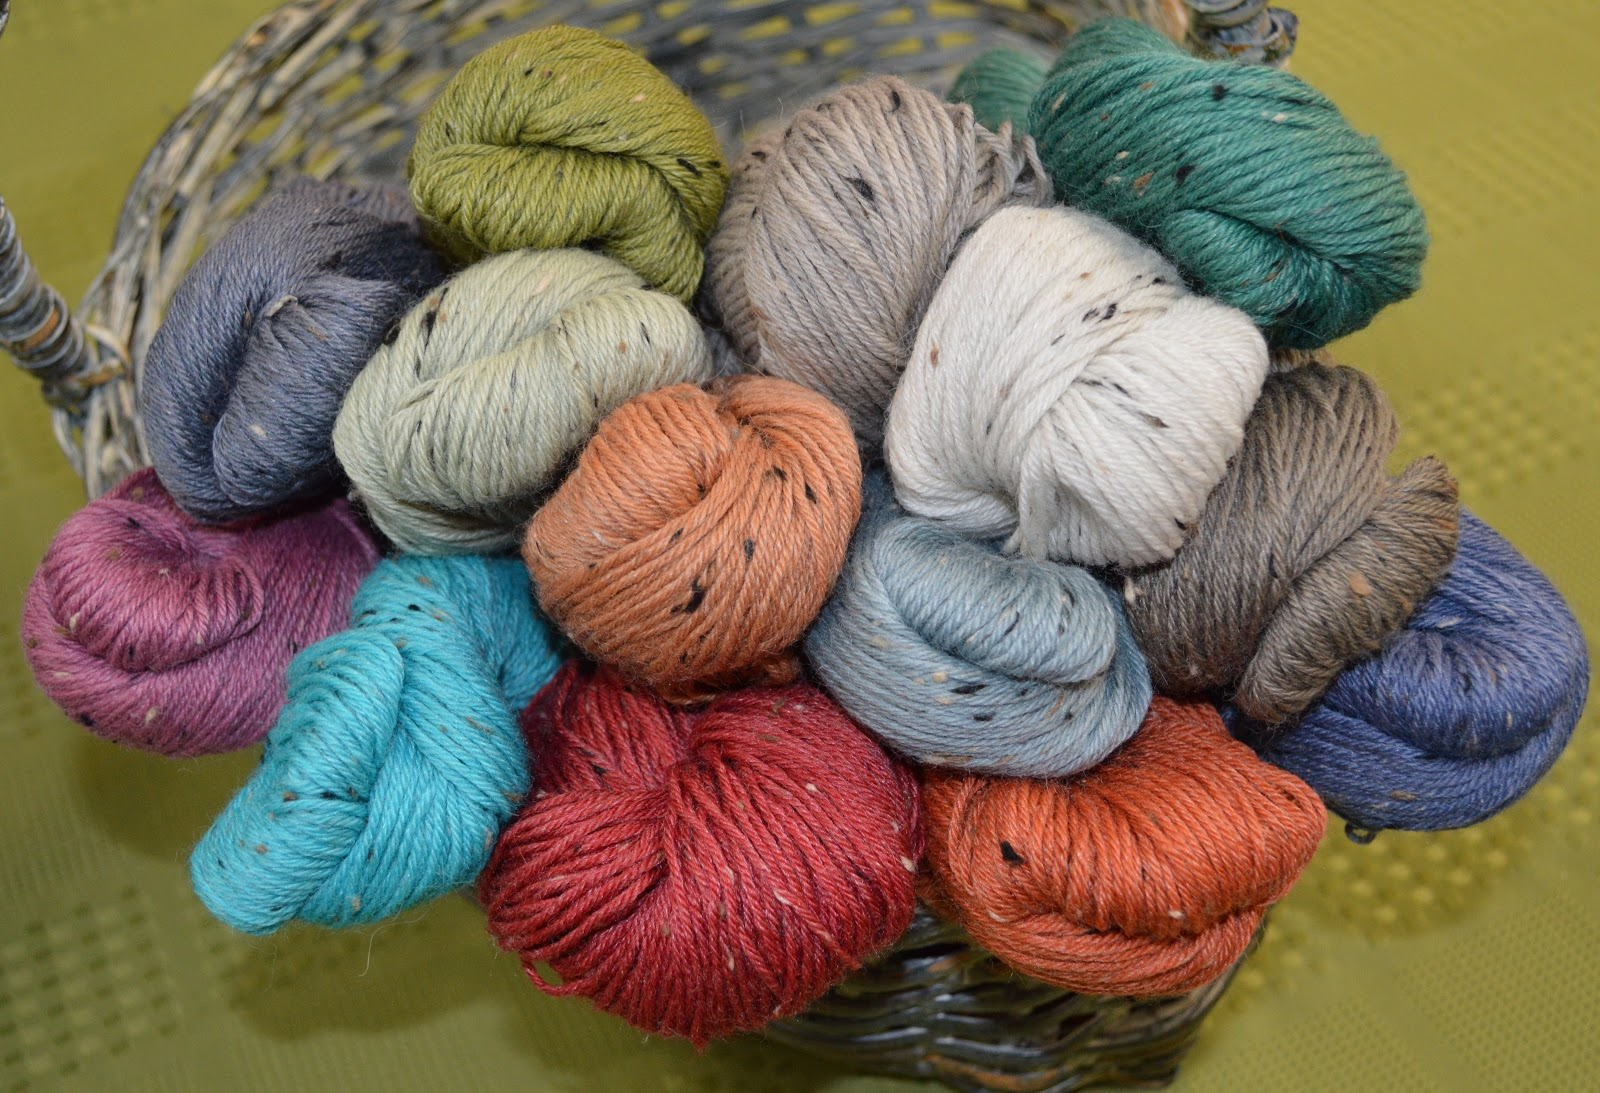 Tangled Purls, fine yarn studio: New Yarn!